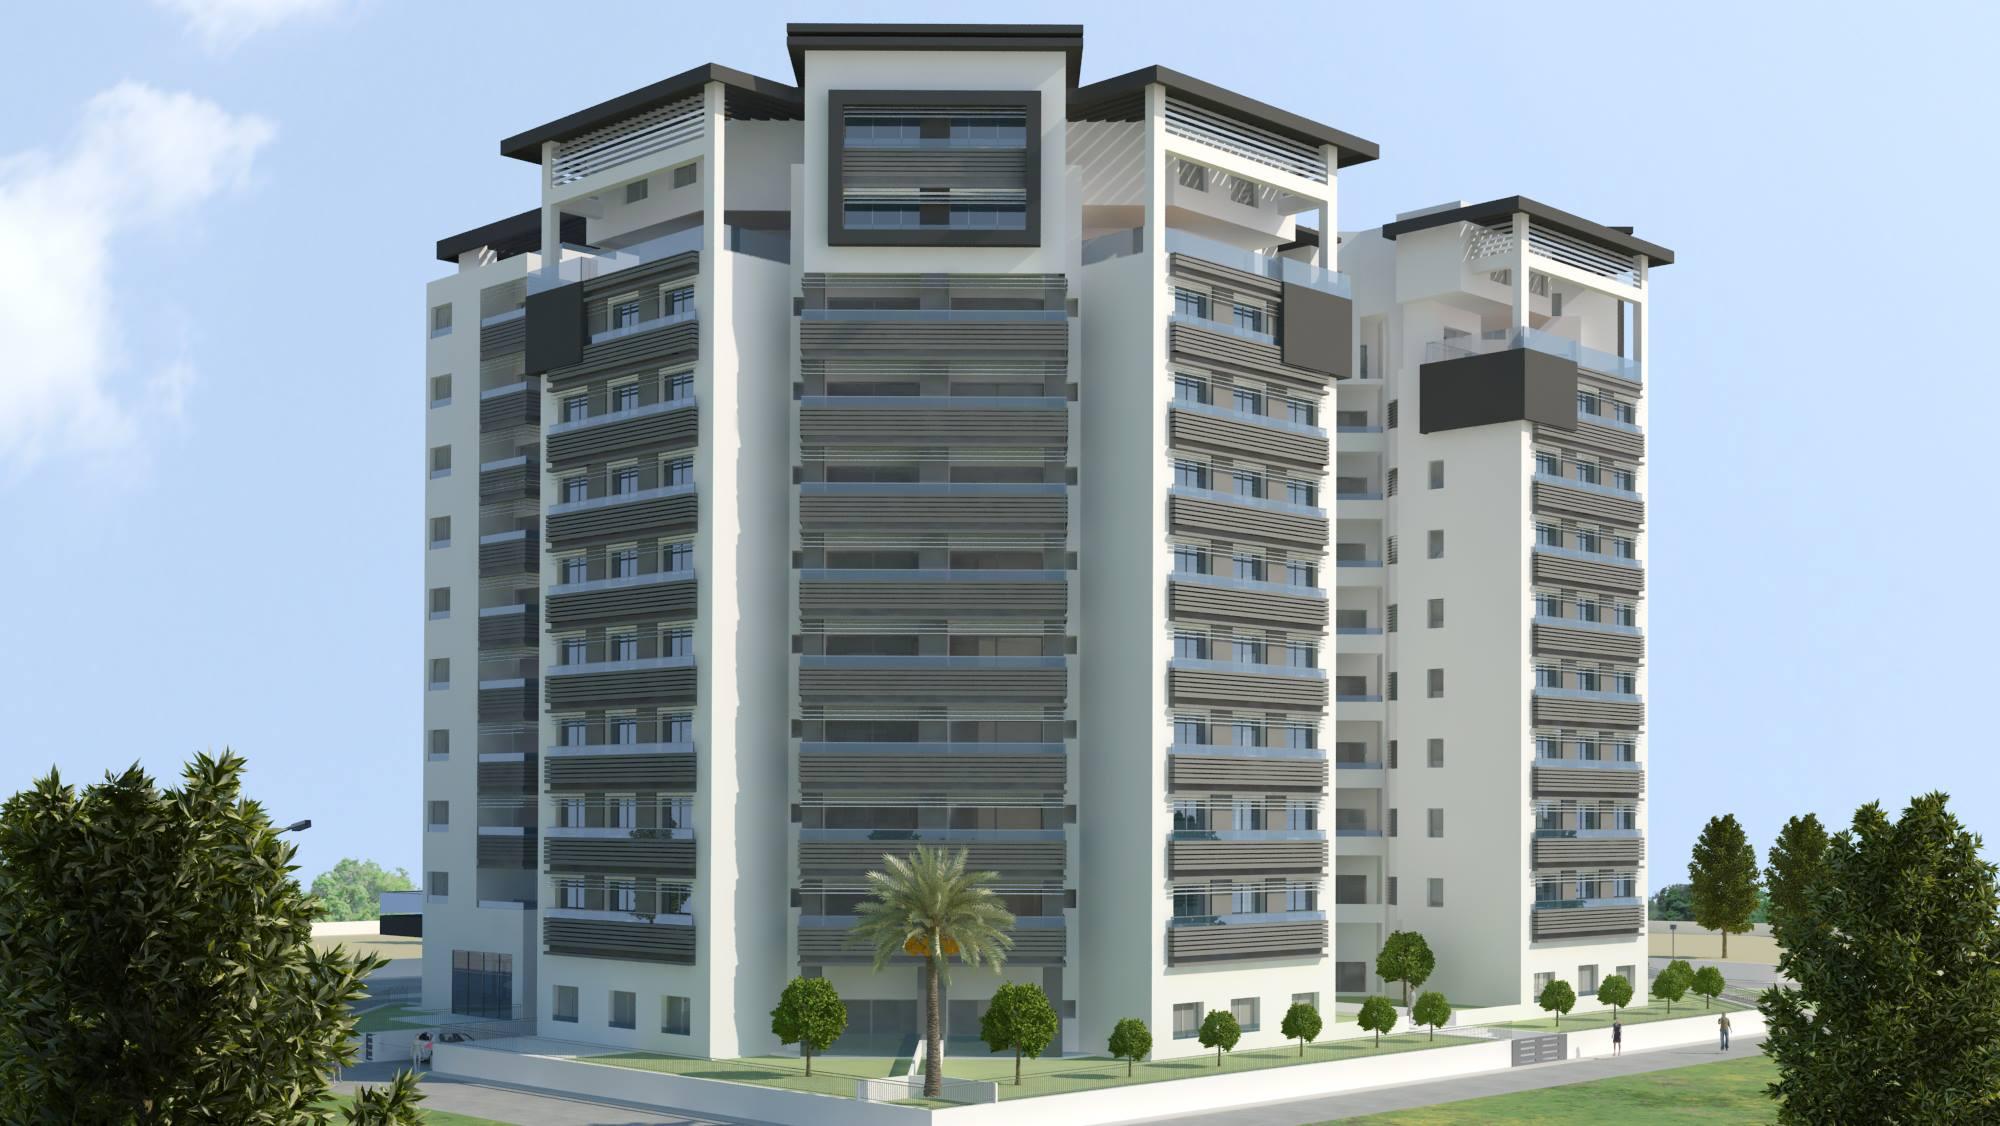 R sidence de haut standing au jardins de carthage r sidence khadija immobilier neuf tunisie - Residence de haut standing ...